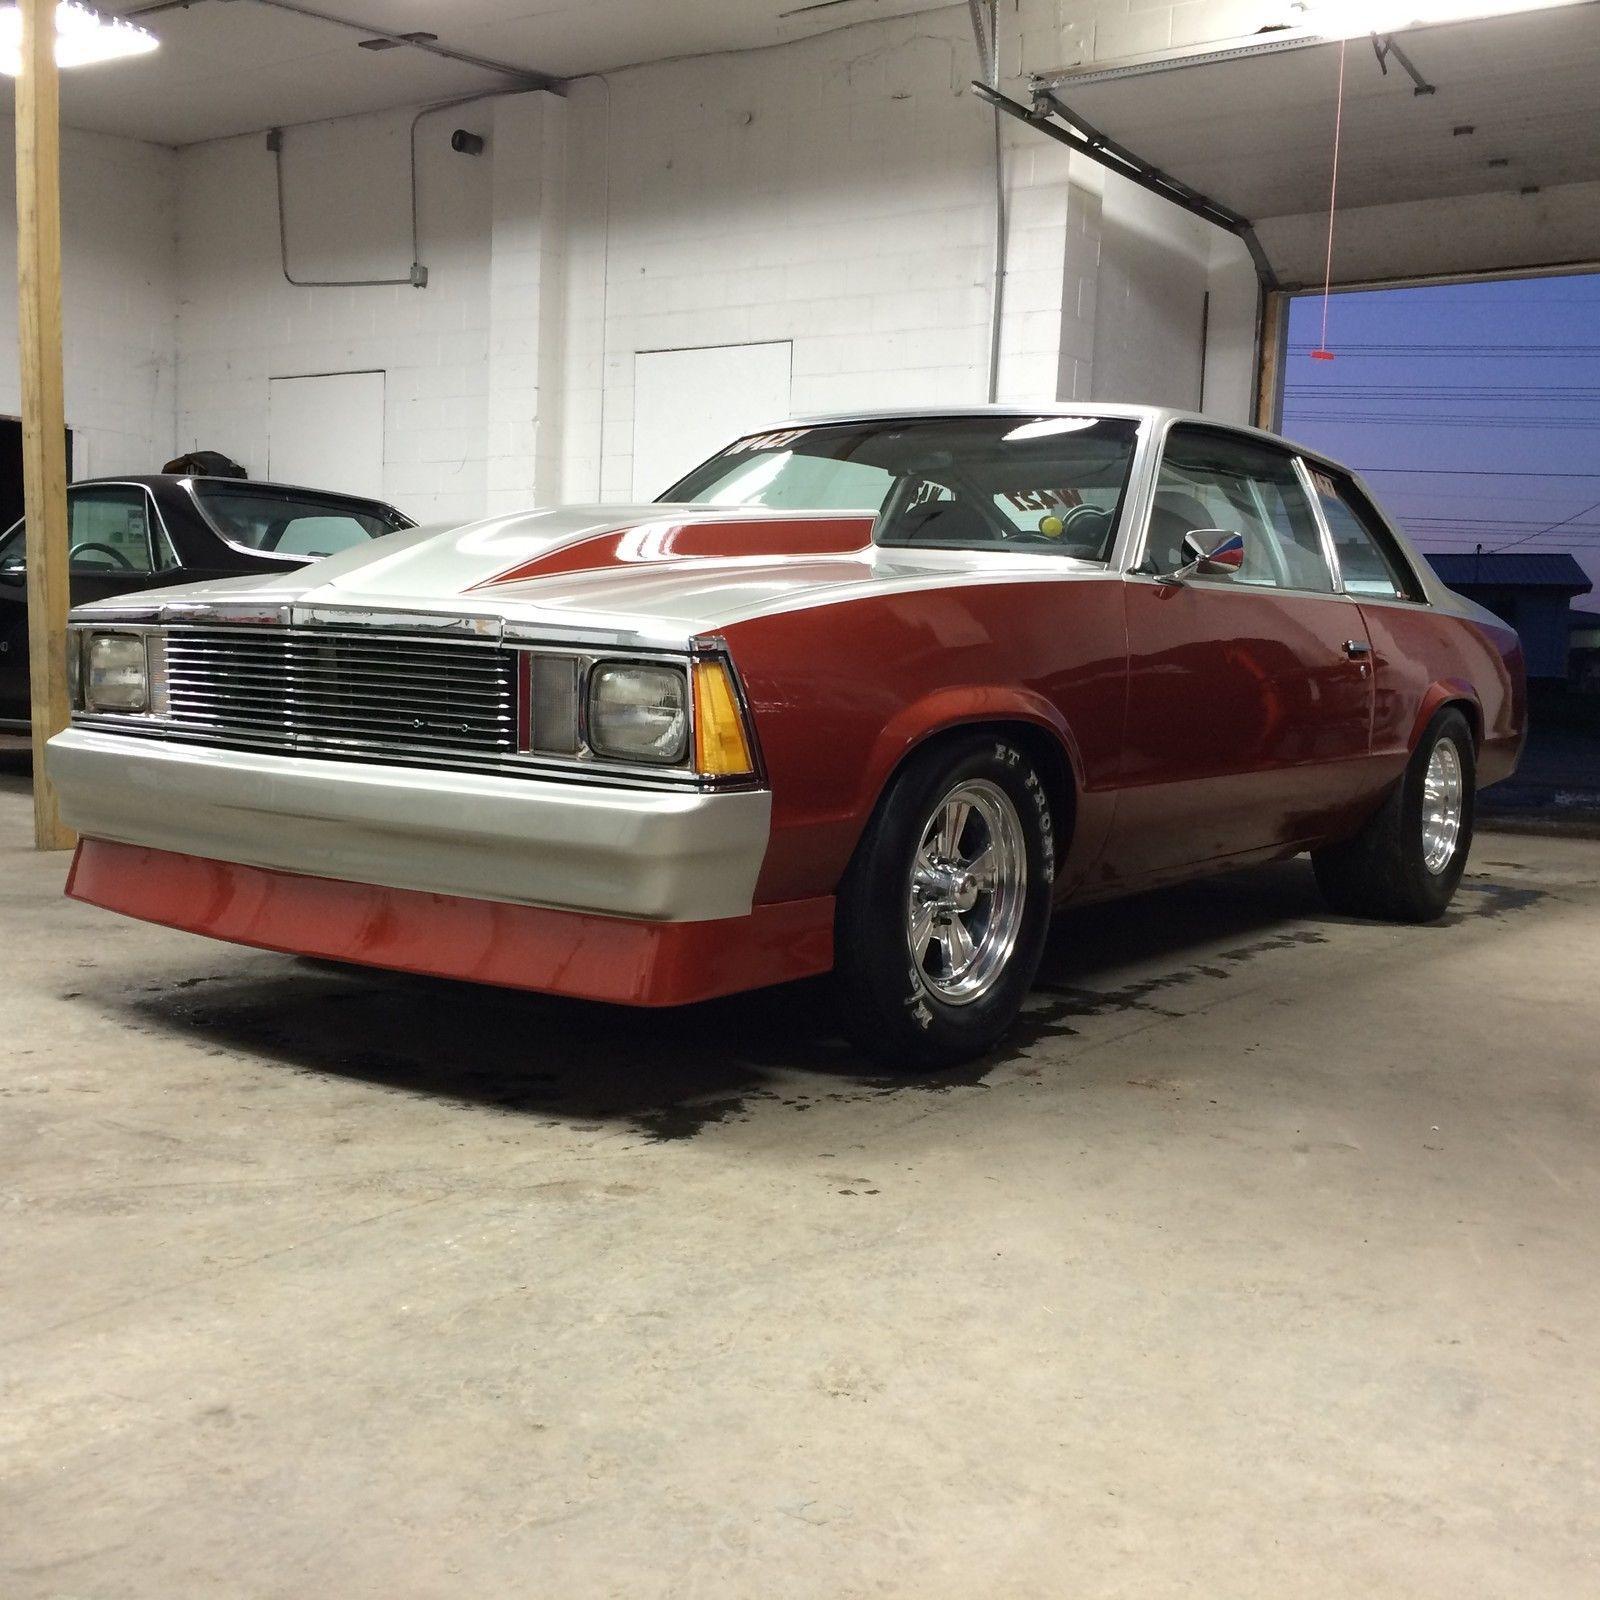 1979 Chevrolet Malibu Race Car | Race cars for sale | Pinterest ...